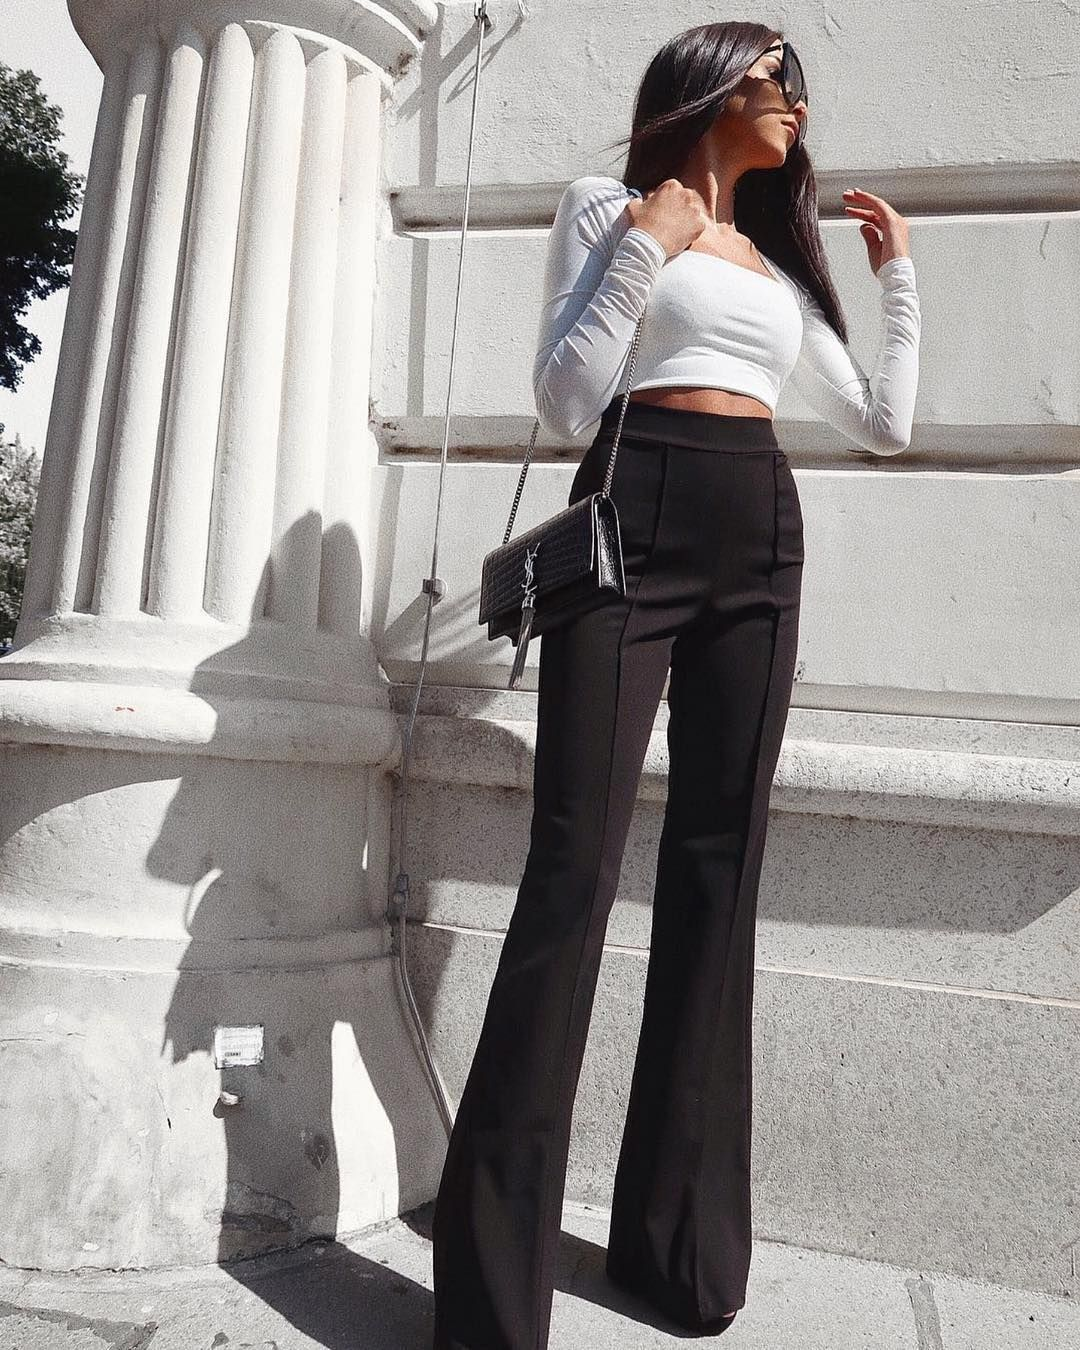 Pin By Amanda Williams On Fashion High Waisted Dress Pants High Waist Fashion Fashion [ 1350 x 1080 Pixel ]